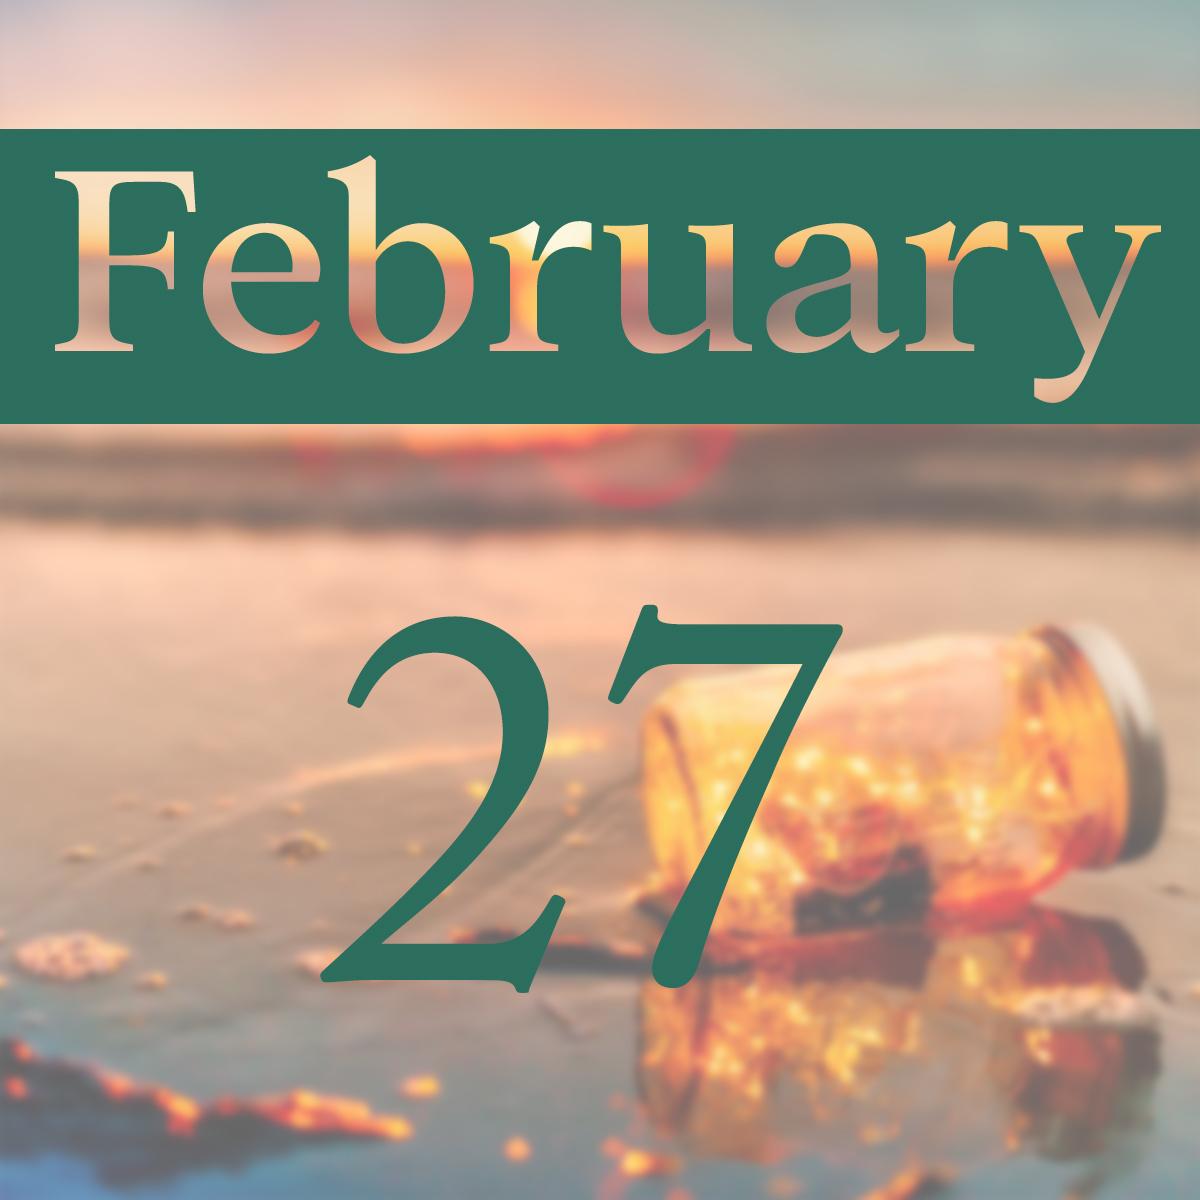 Thursday, February 27th